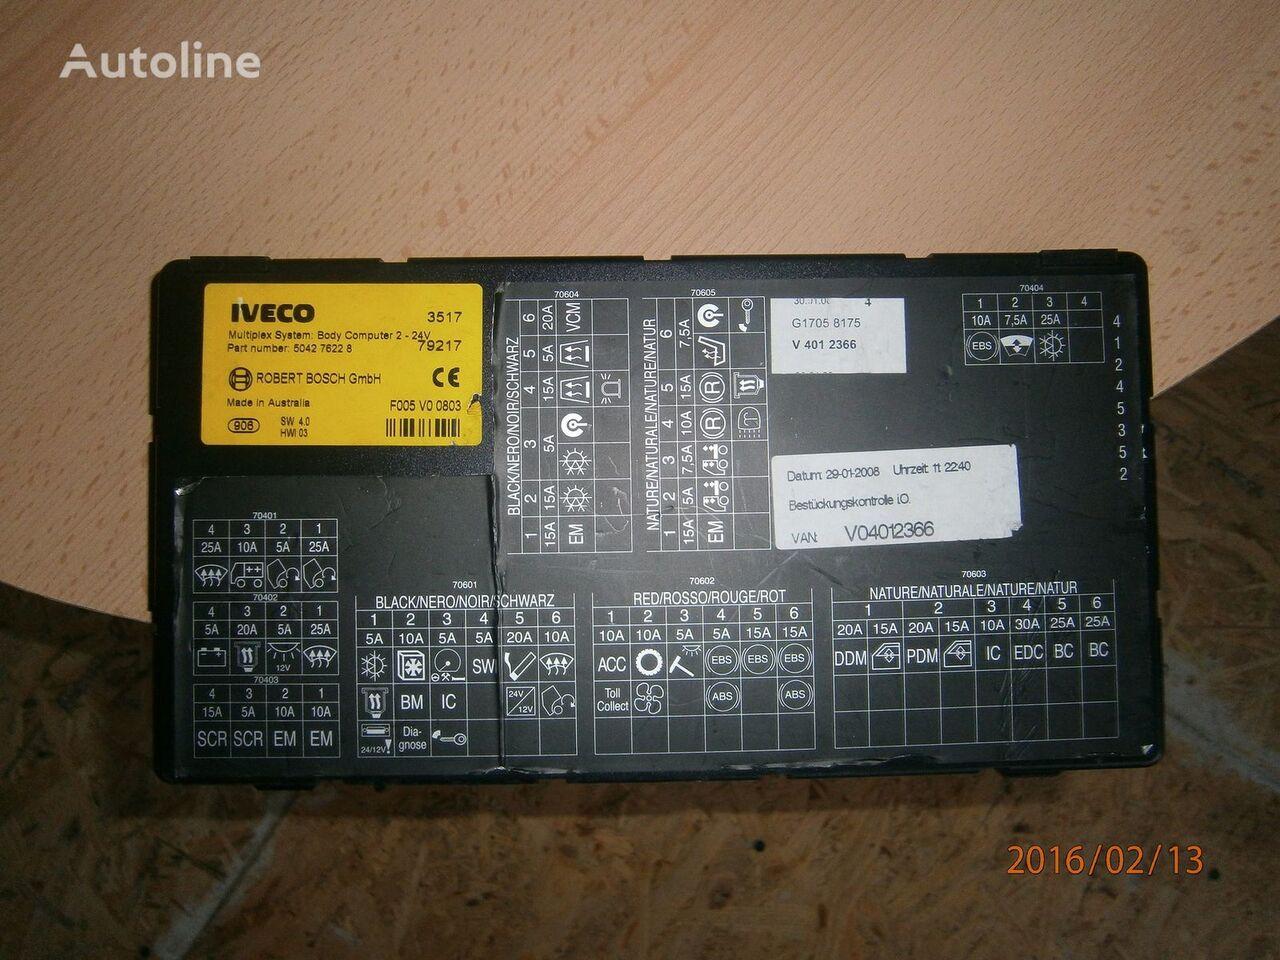 Iveco Stralis EURO5 Multiplex system body computer 504276228 unitate de control pentru IVECO Stralis autotractor